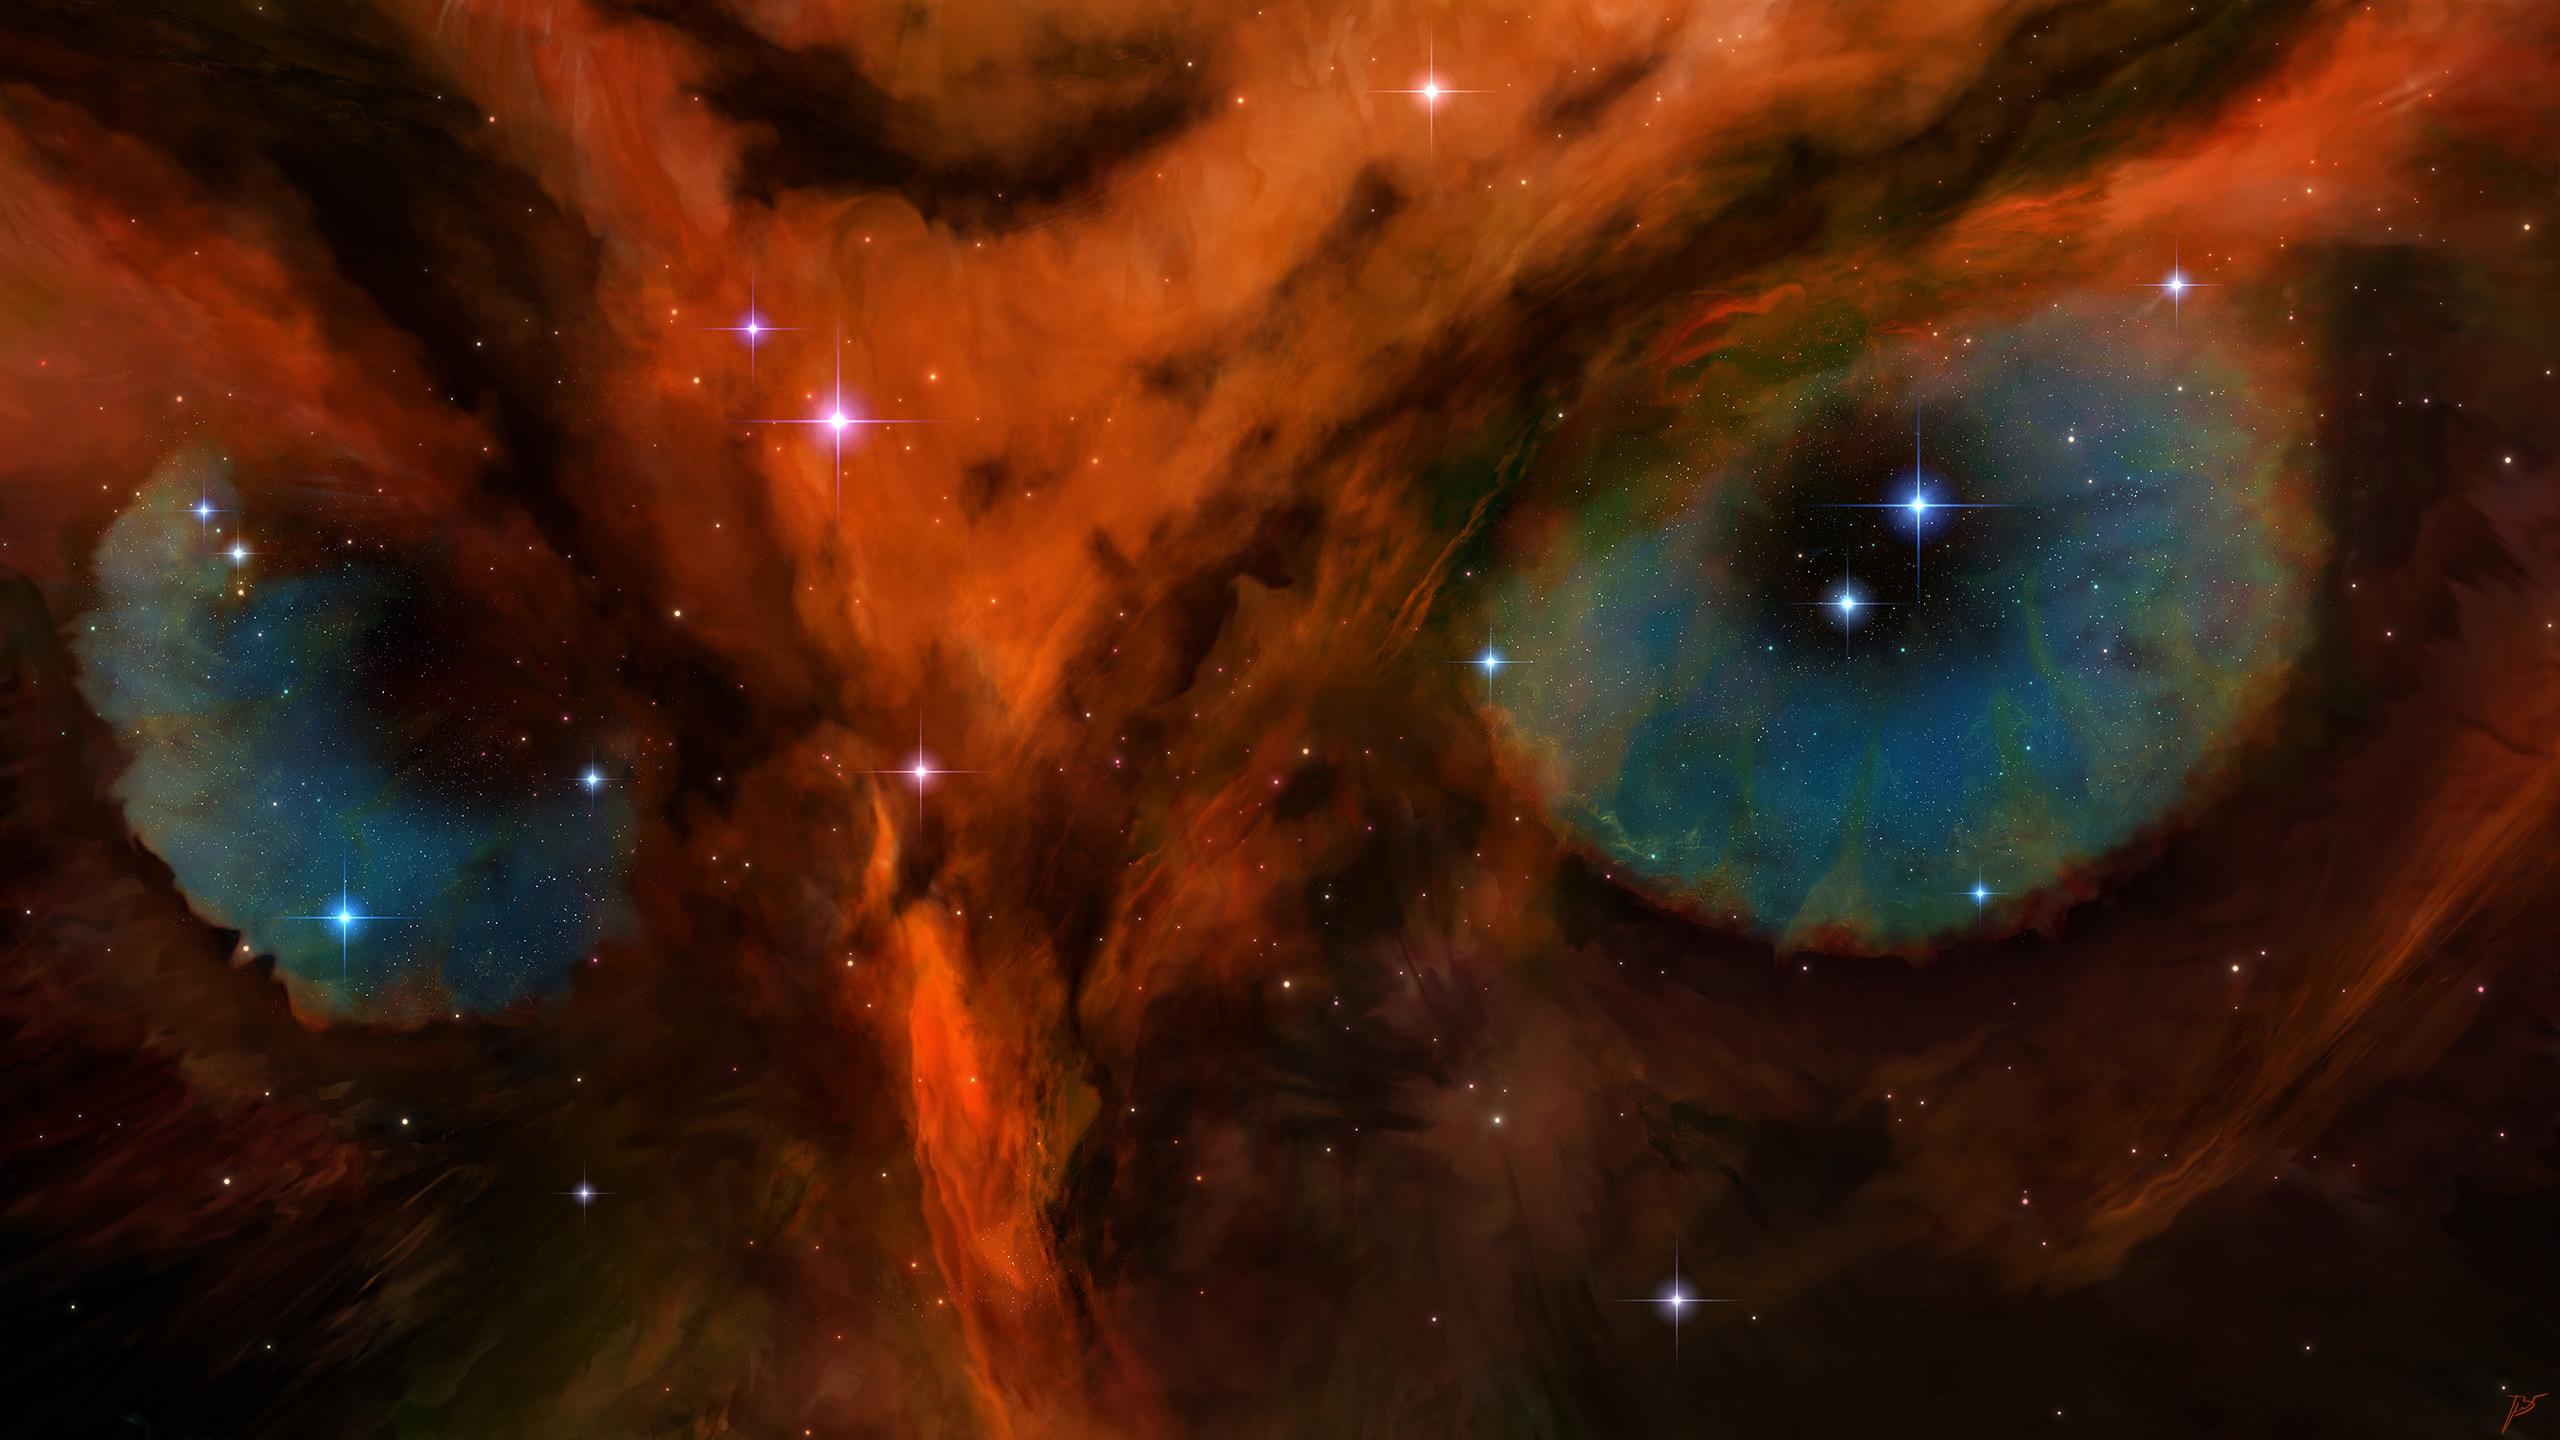 General 2560x1440 JoeyJazz nebula space art owl nature animal eyes